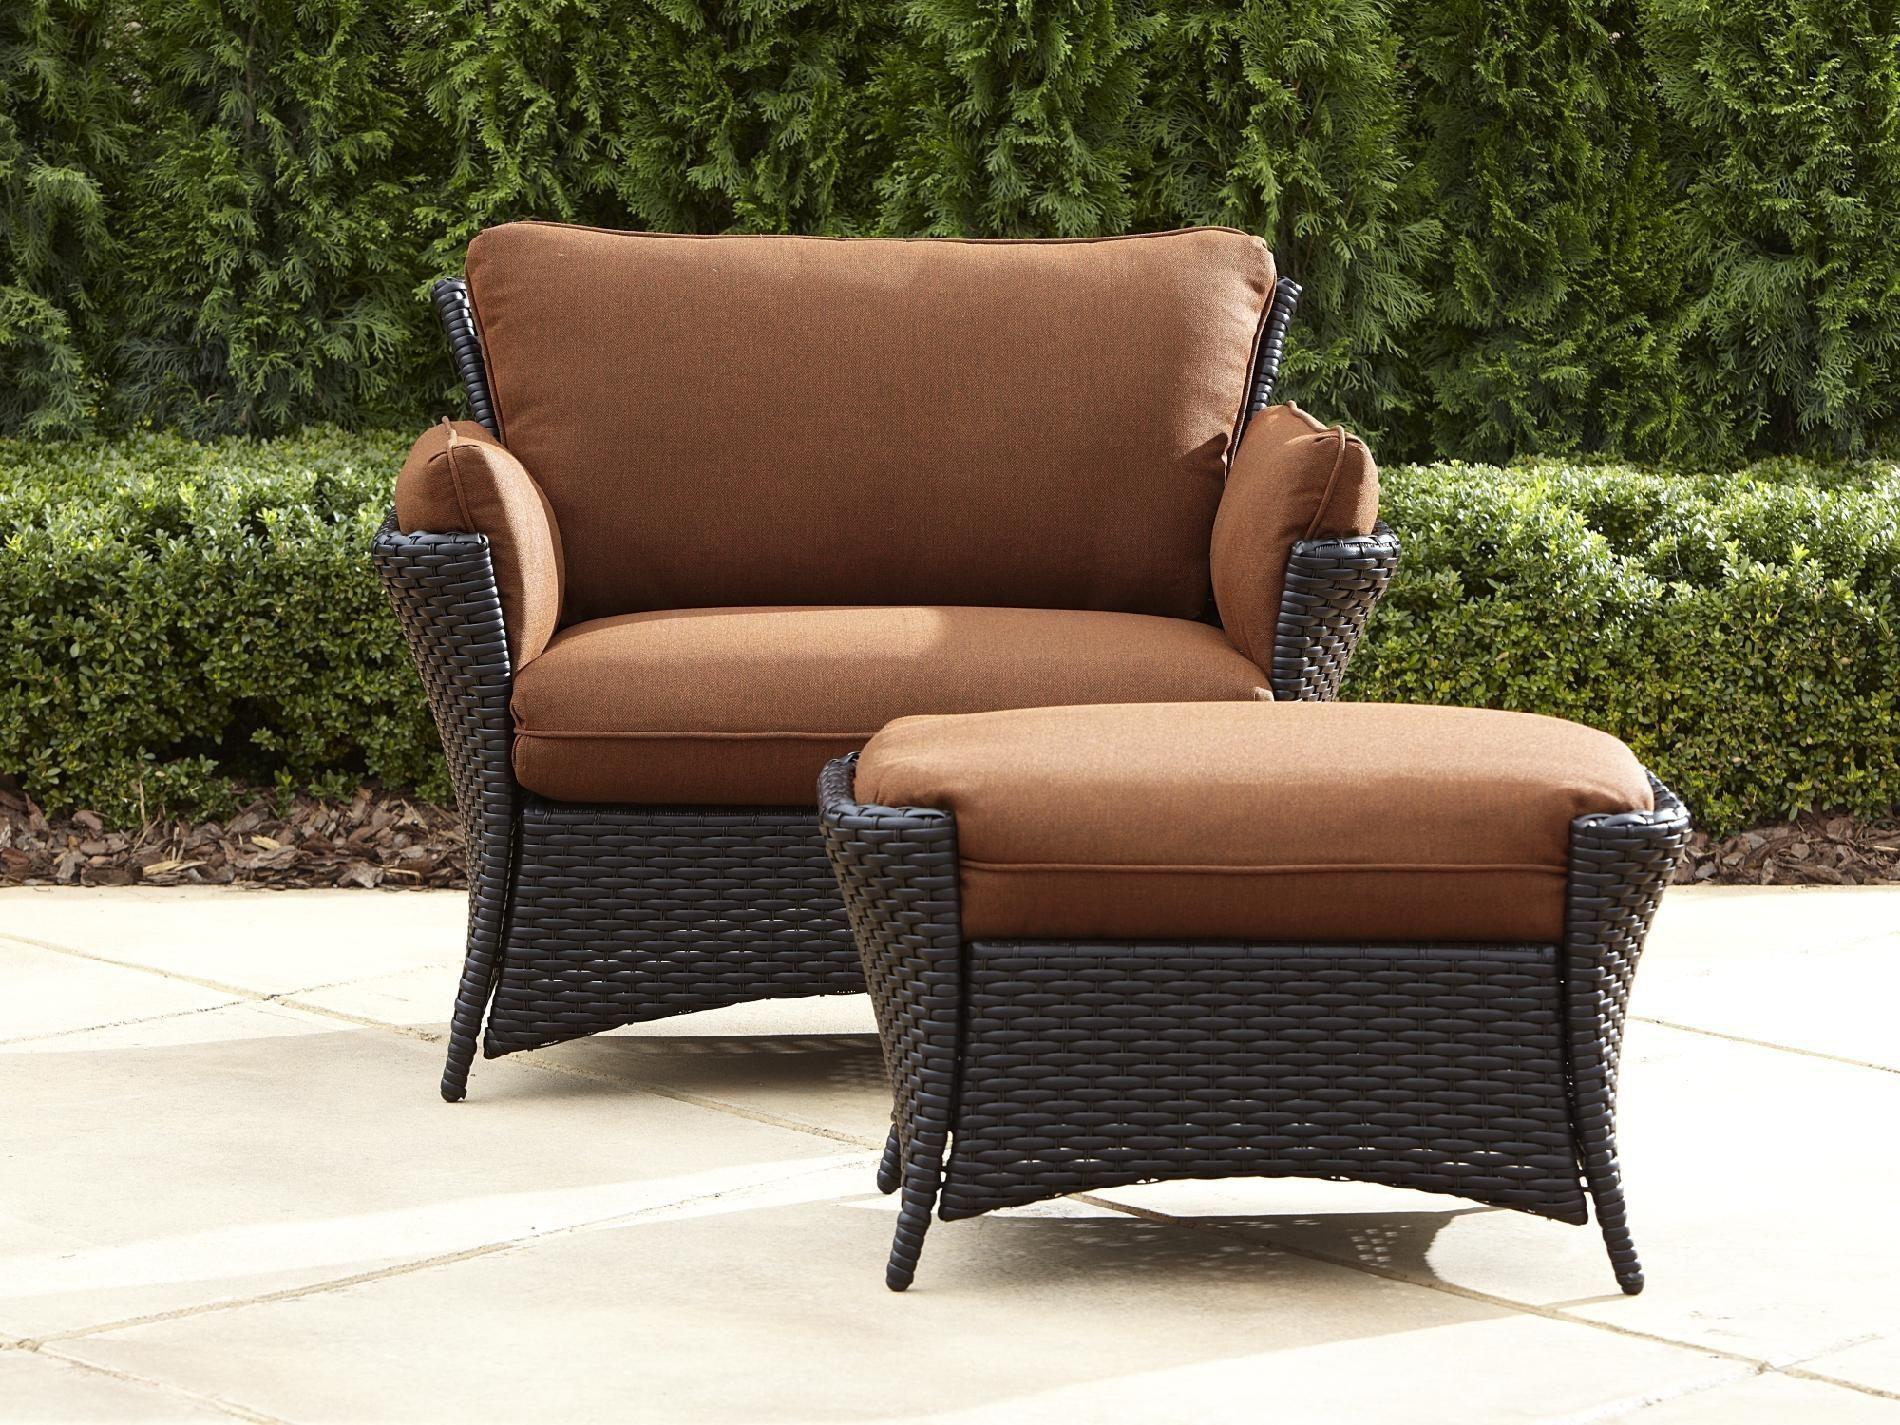 Oversized Patio Furniture